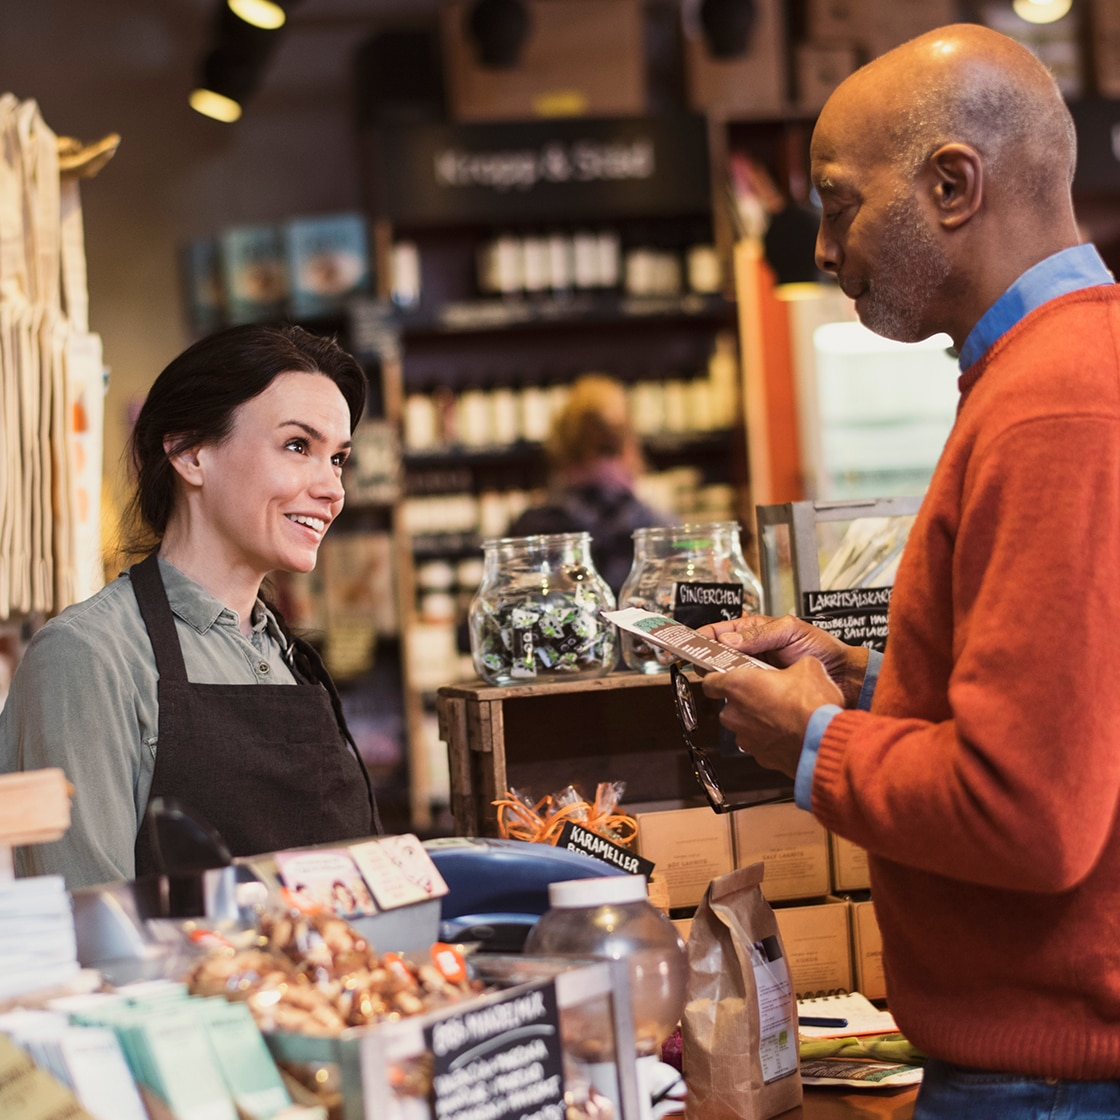 man making a purchase